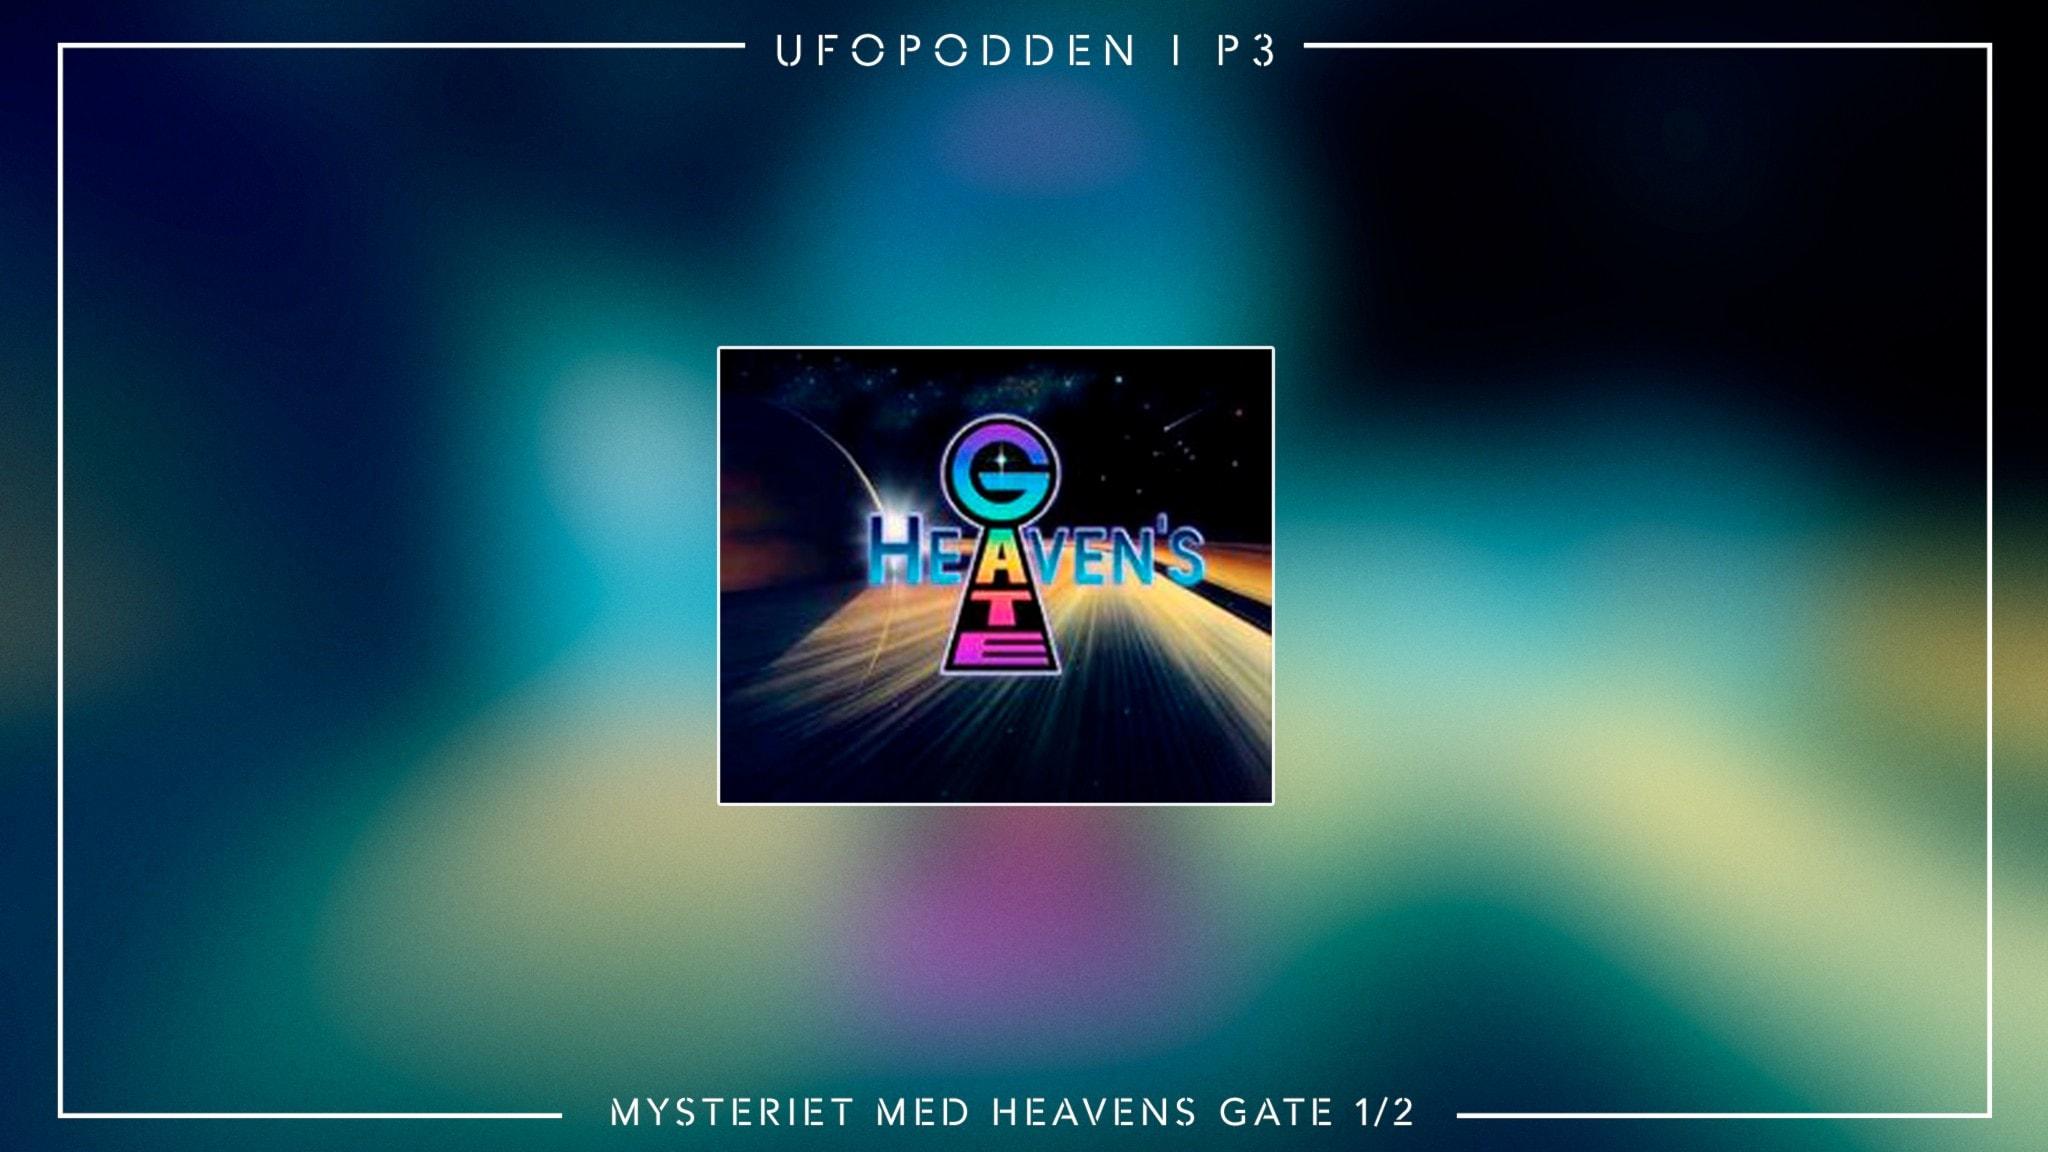 Ufopodden Mysteriet med Heavens Gate del 1/2